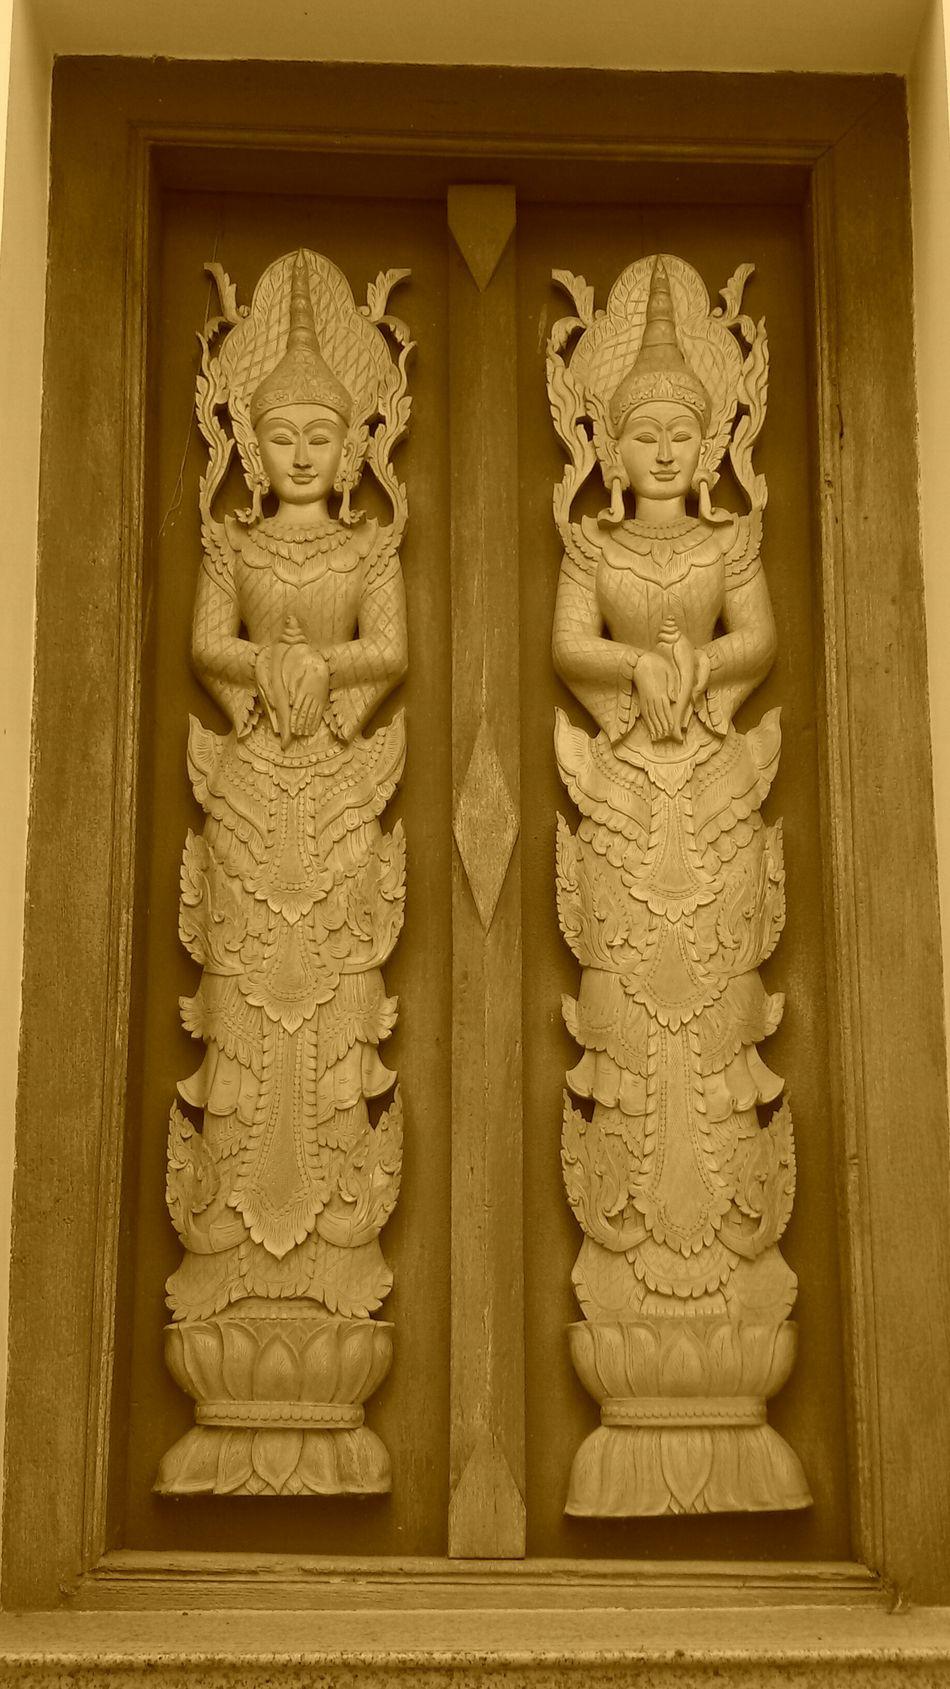 Crafts, Wood, Sculpture, Angels, Door of Vihan, Beautiful Image of Creative Crafts, Getting In Spired. .